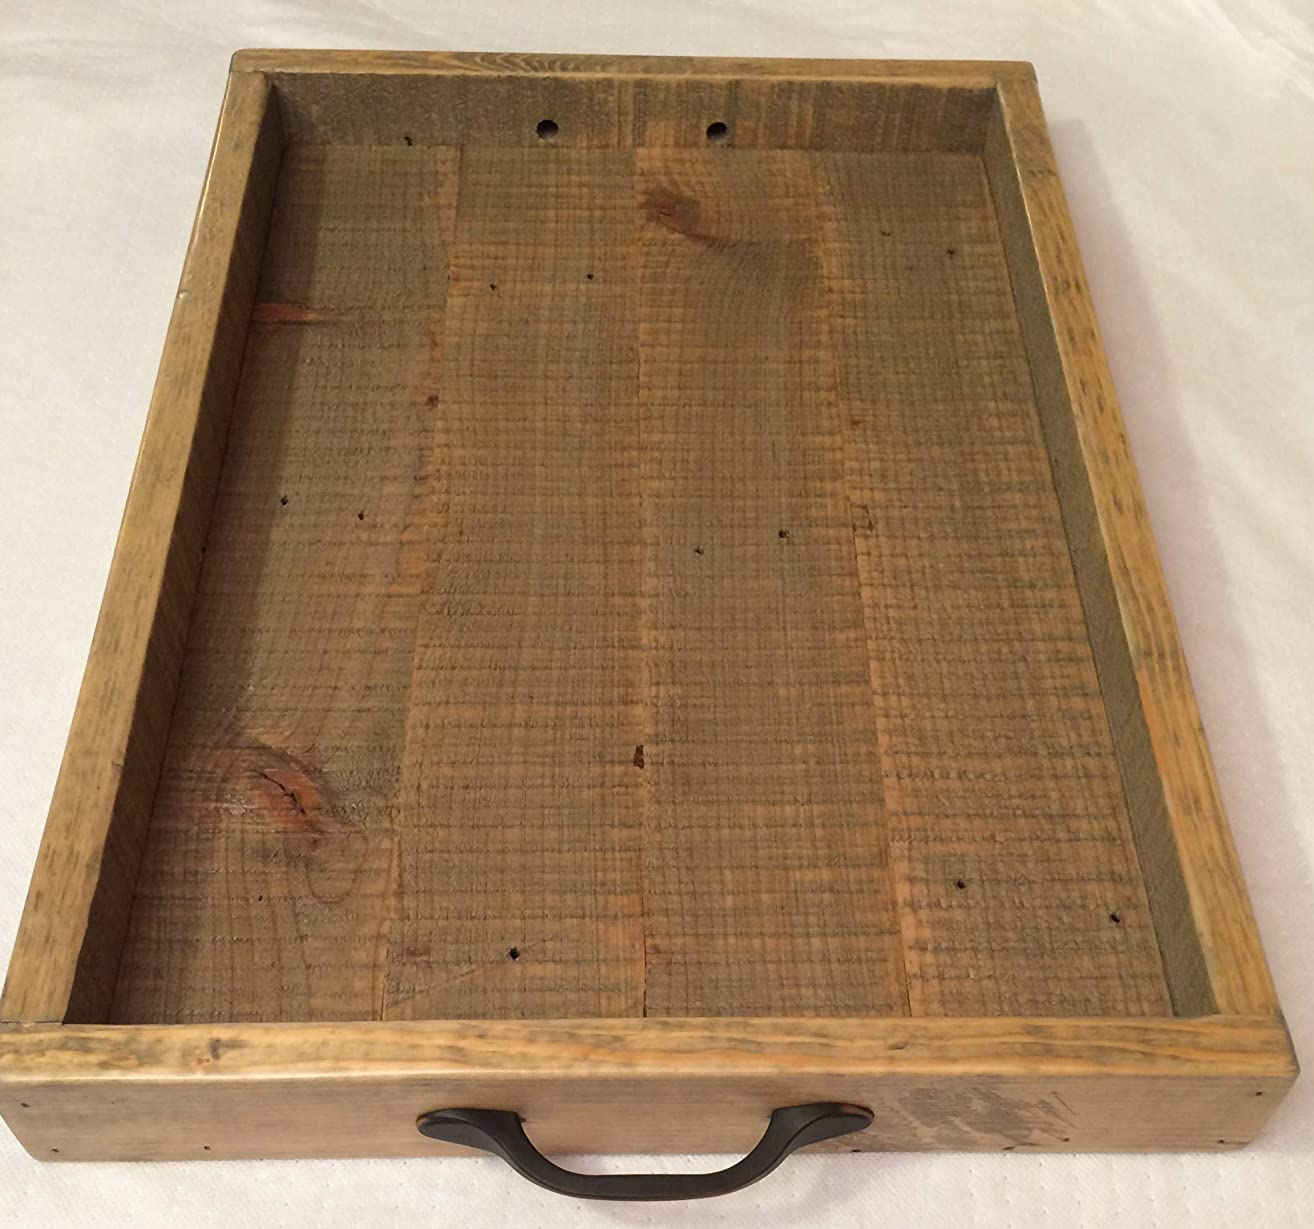 Rustic Serving Tray, Tea Tray, Decorative Serving Trays, Serving Tray, Ottoman Tray, Wooden Tray, Bed Tray, Coffee Tray, Tray With Handle